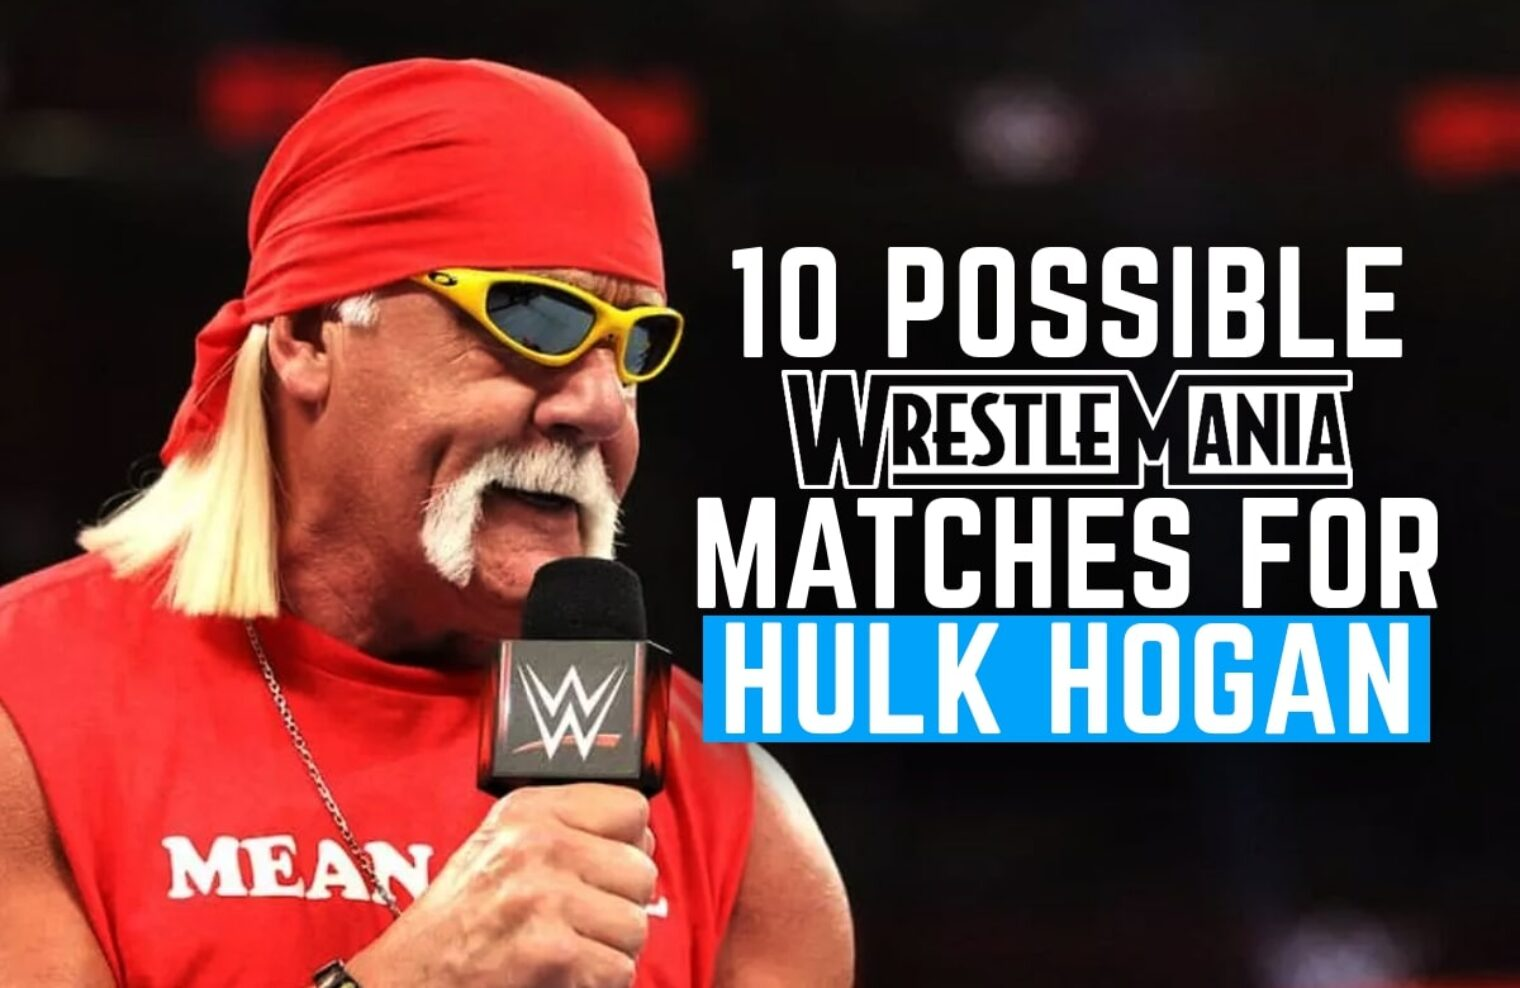 10 Possible Wrestlemania Matches For Hulk Hogan – WebIsJericho.com